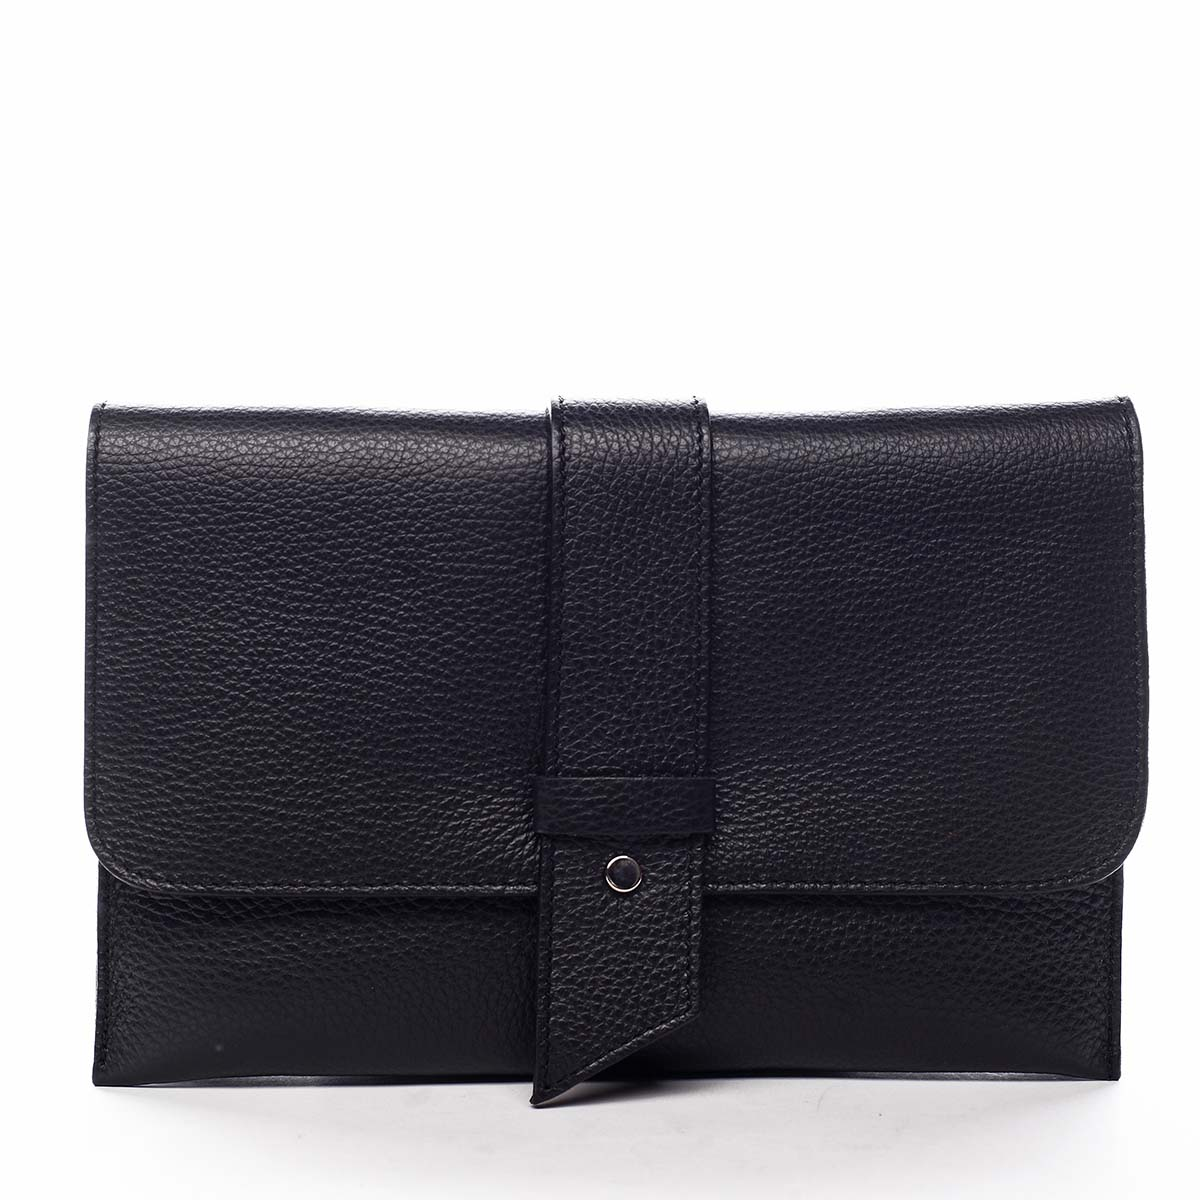 Luxusná dámska kabelka čierna - ItalY Brother čierna